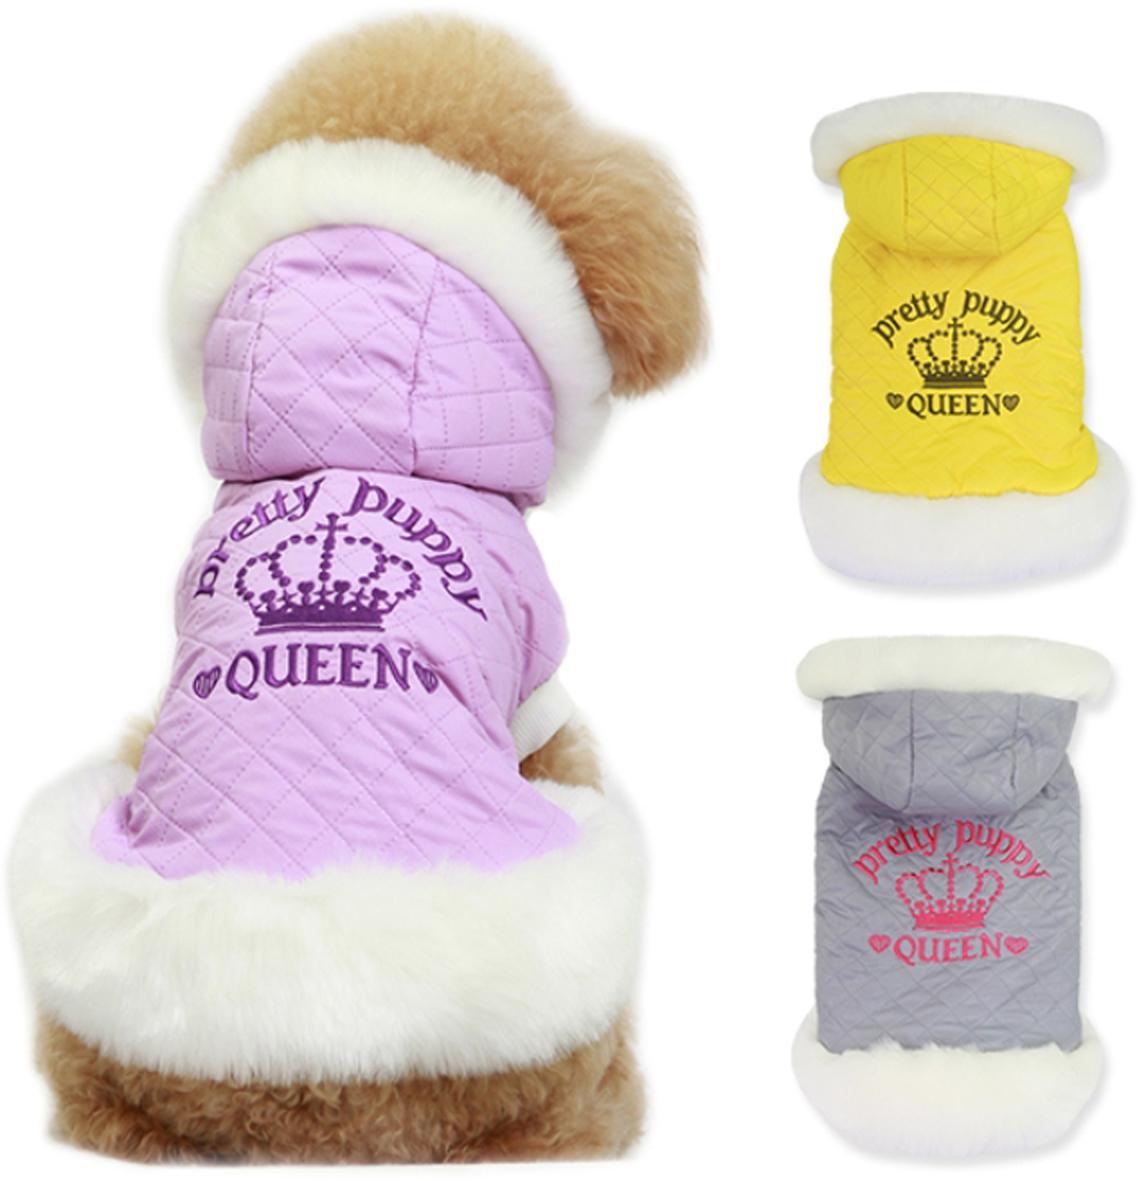 Куртка для собак Dobaz Pretty Puppy, цвет: сиреневый. ДА14068АХС. Размер XS куртка для собак dobaz цвет серый черный да1222вхс размер xs